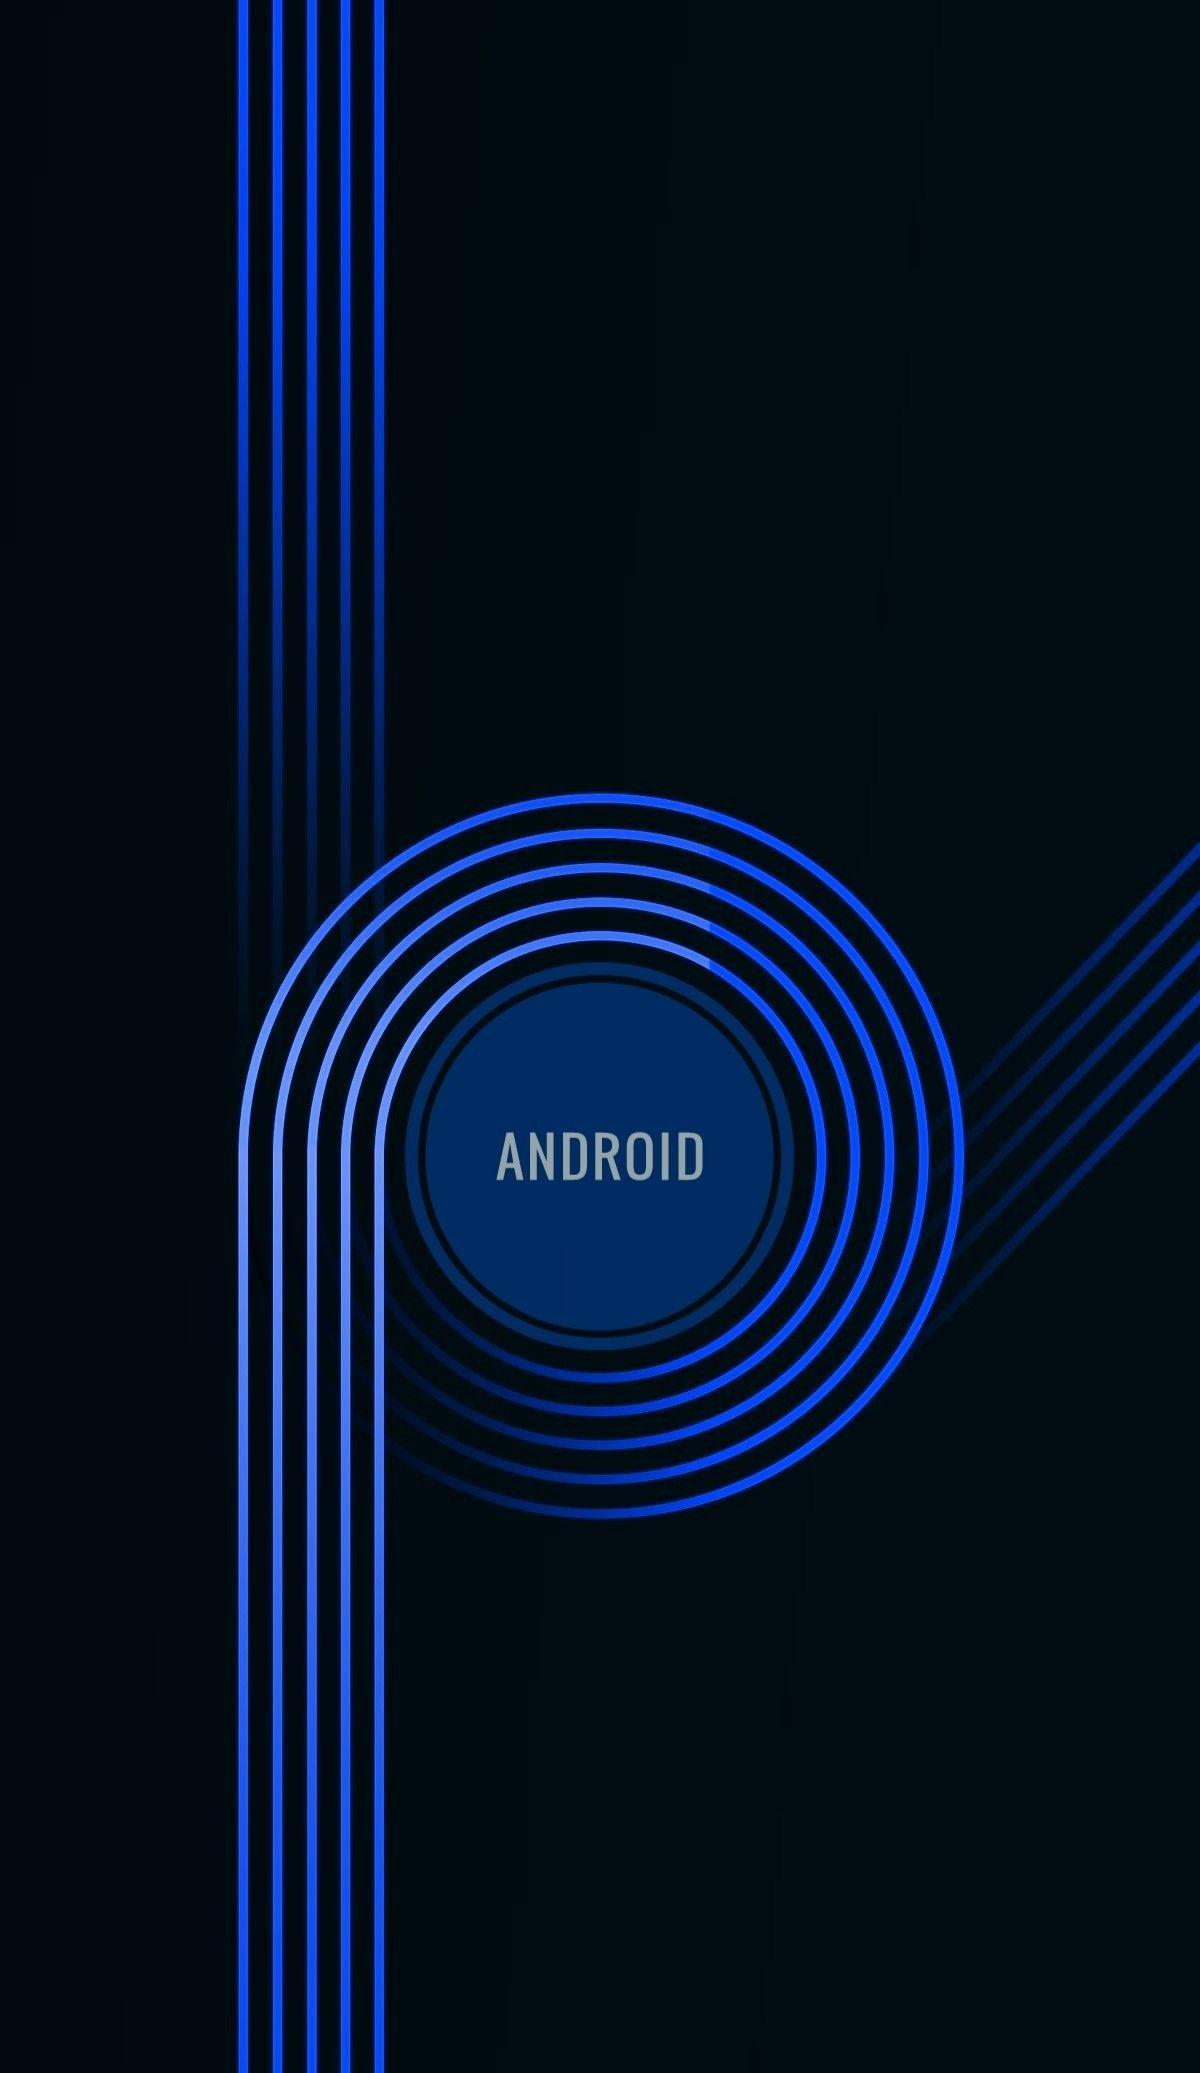 List of Good Black Wallpaper for Smartphones 2019